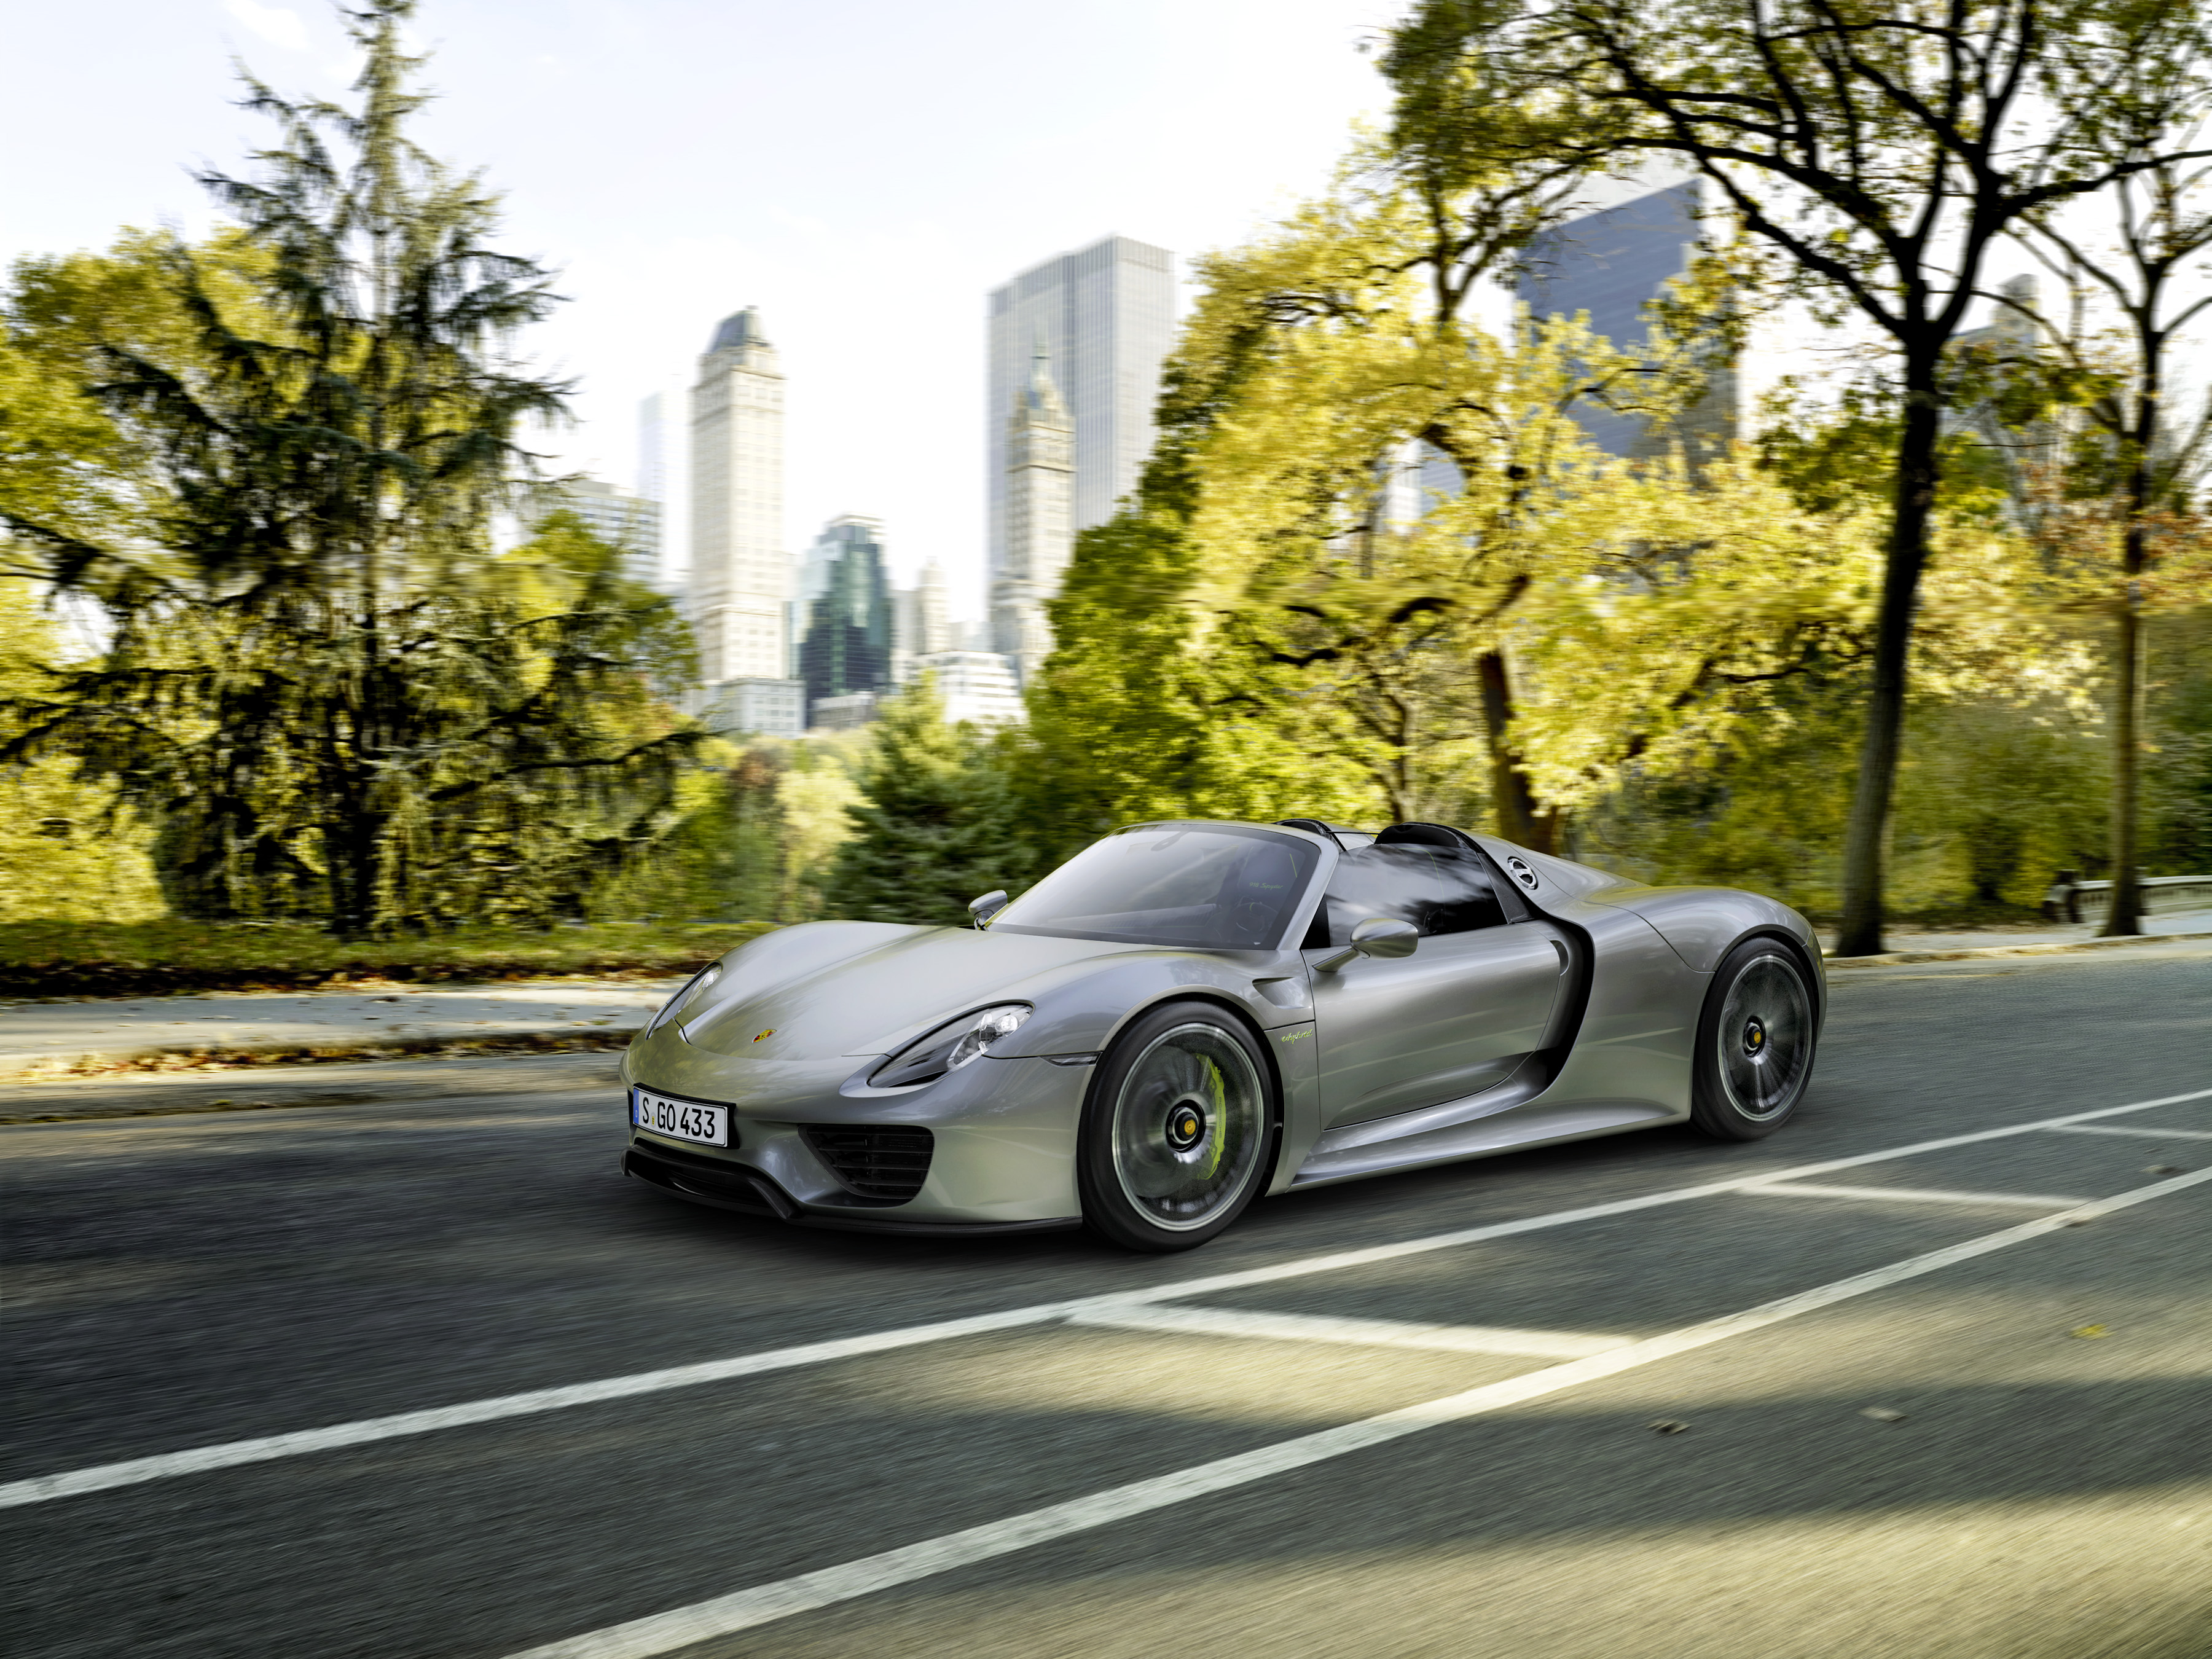 production ready porsche 918 spyder revealed cf blog - Porsche 918 Production Wallpaper